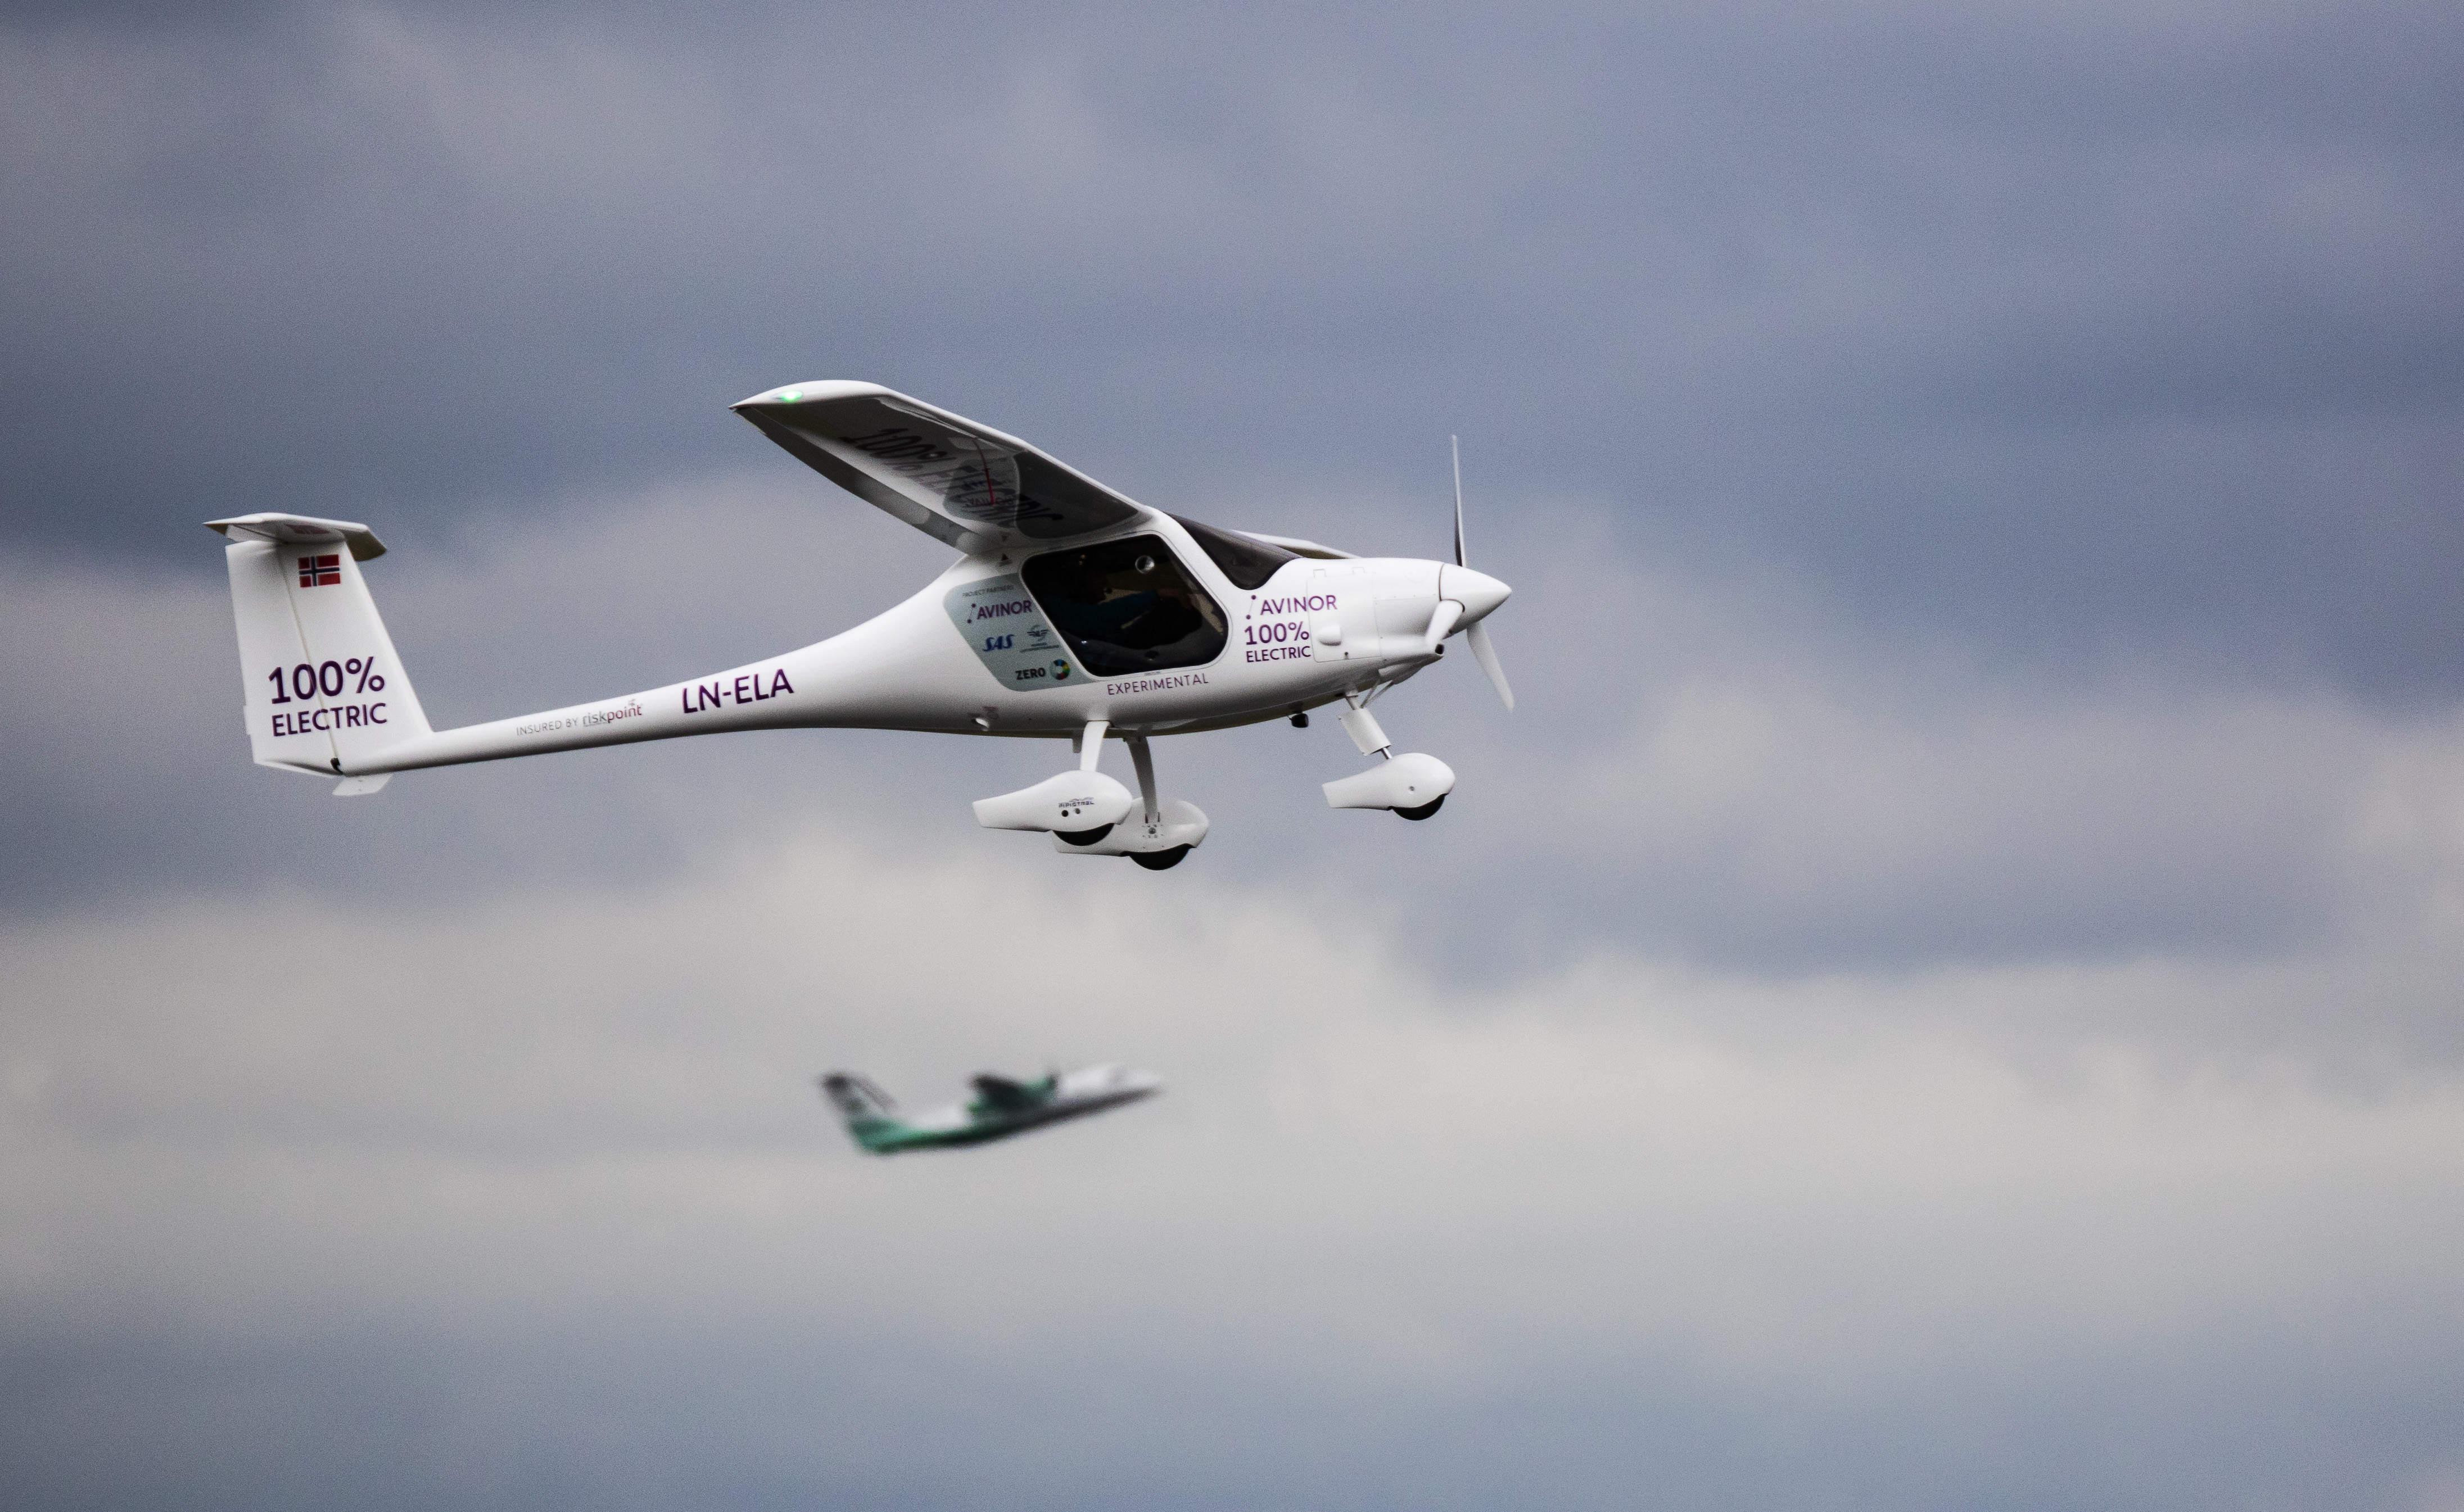 Electric planes